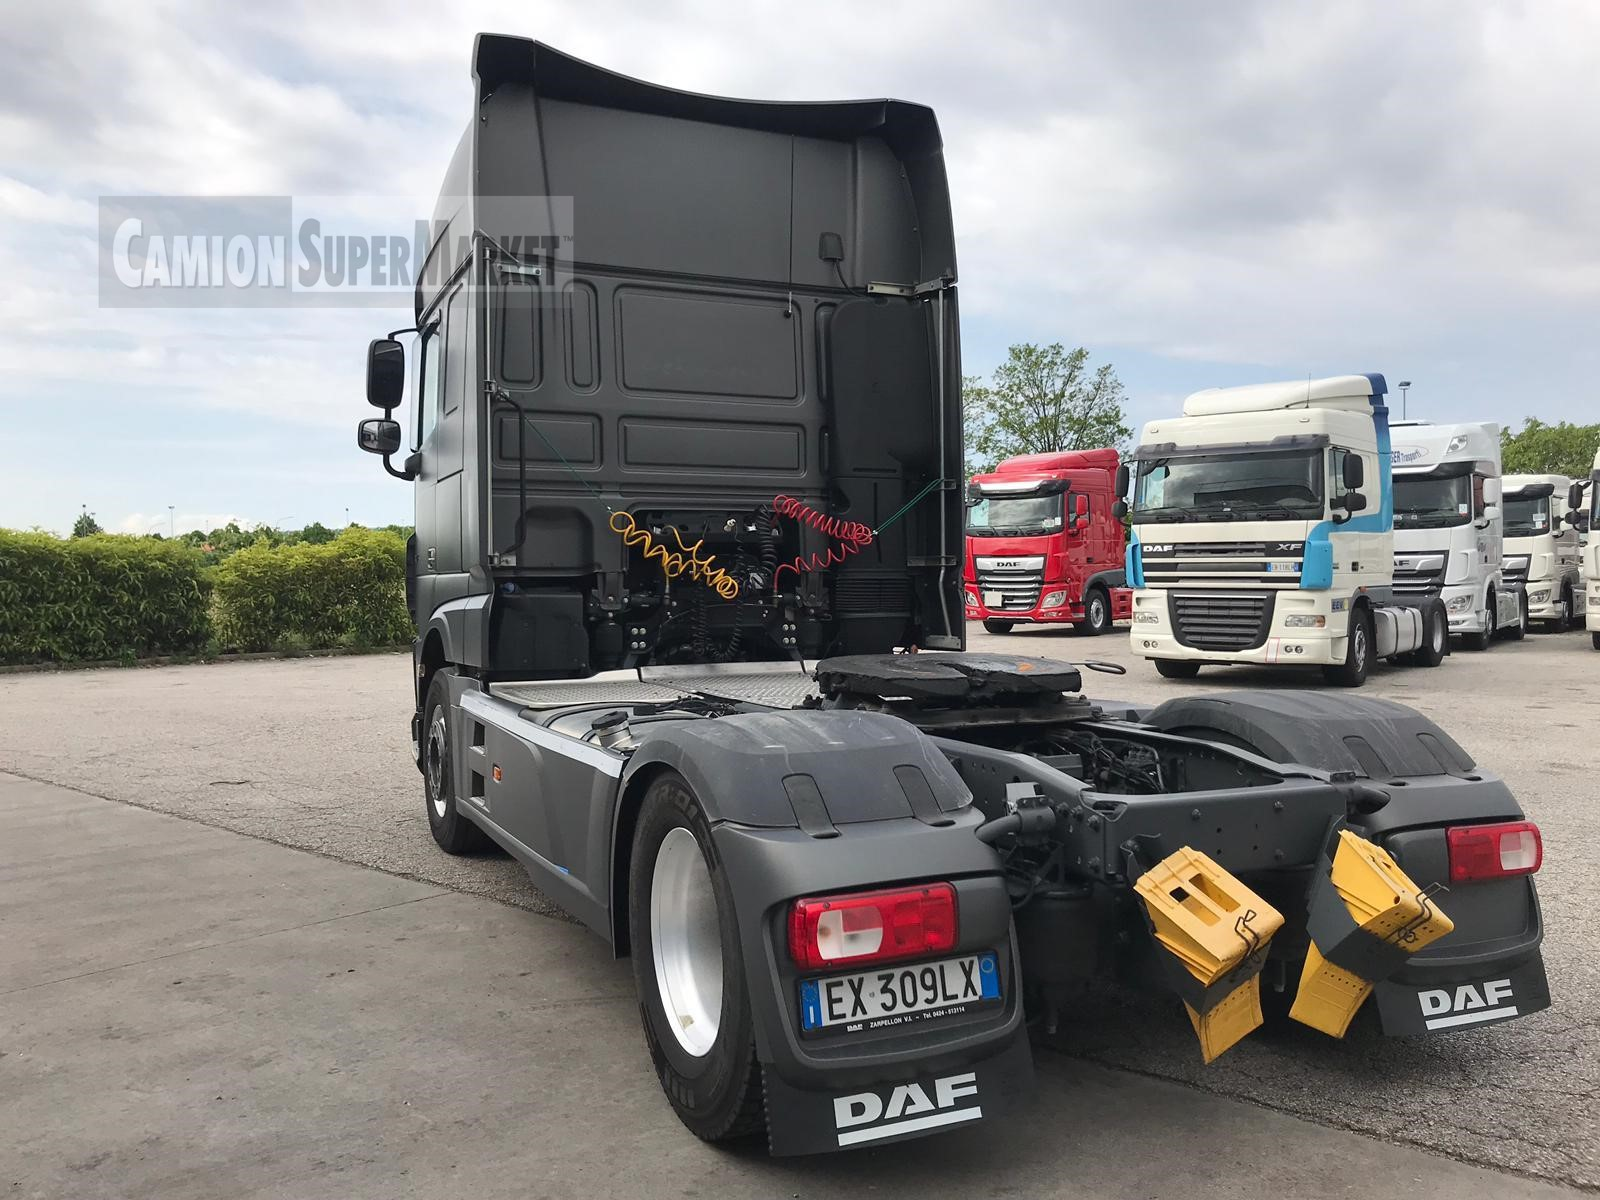 Daf XF510 Uzywany 2015 Veneto